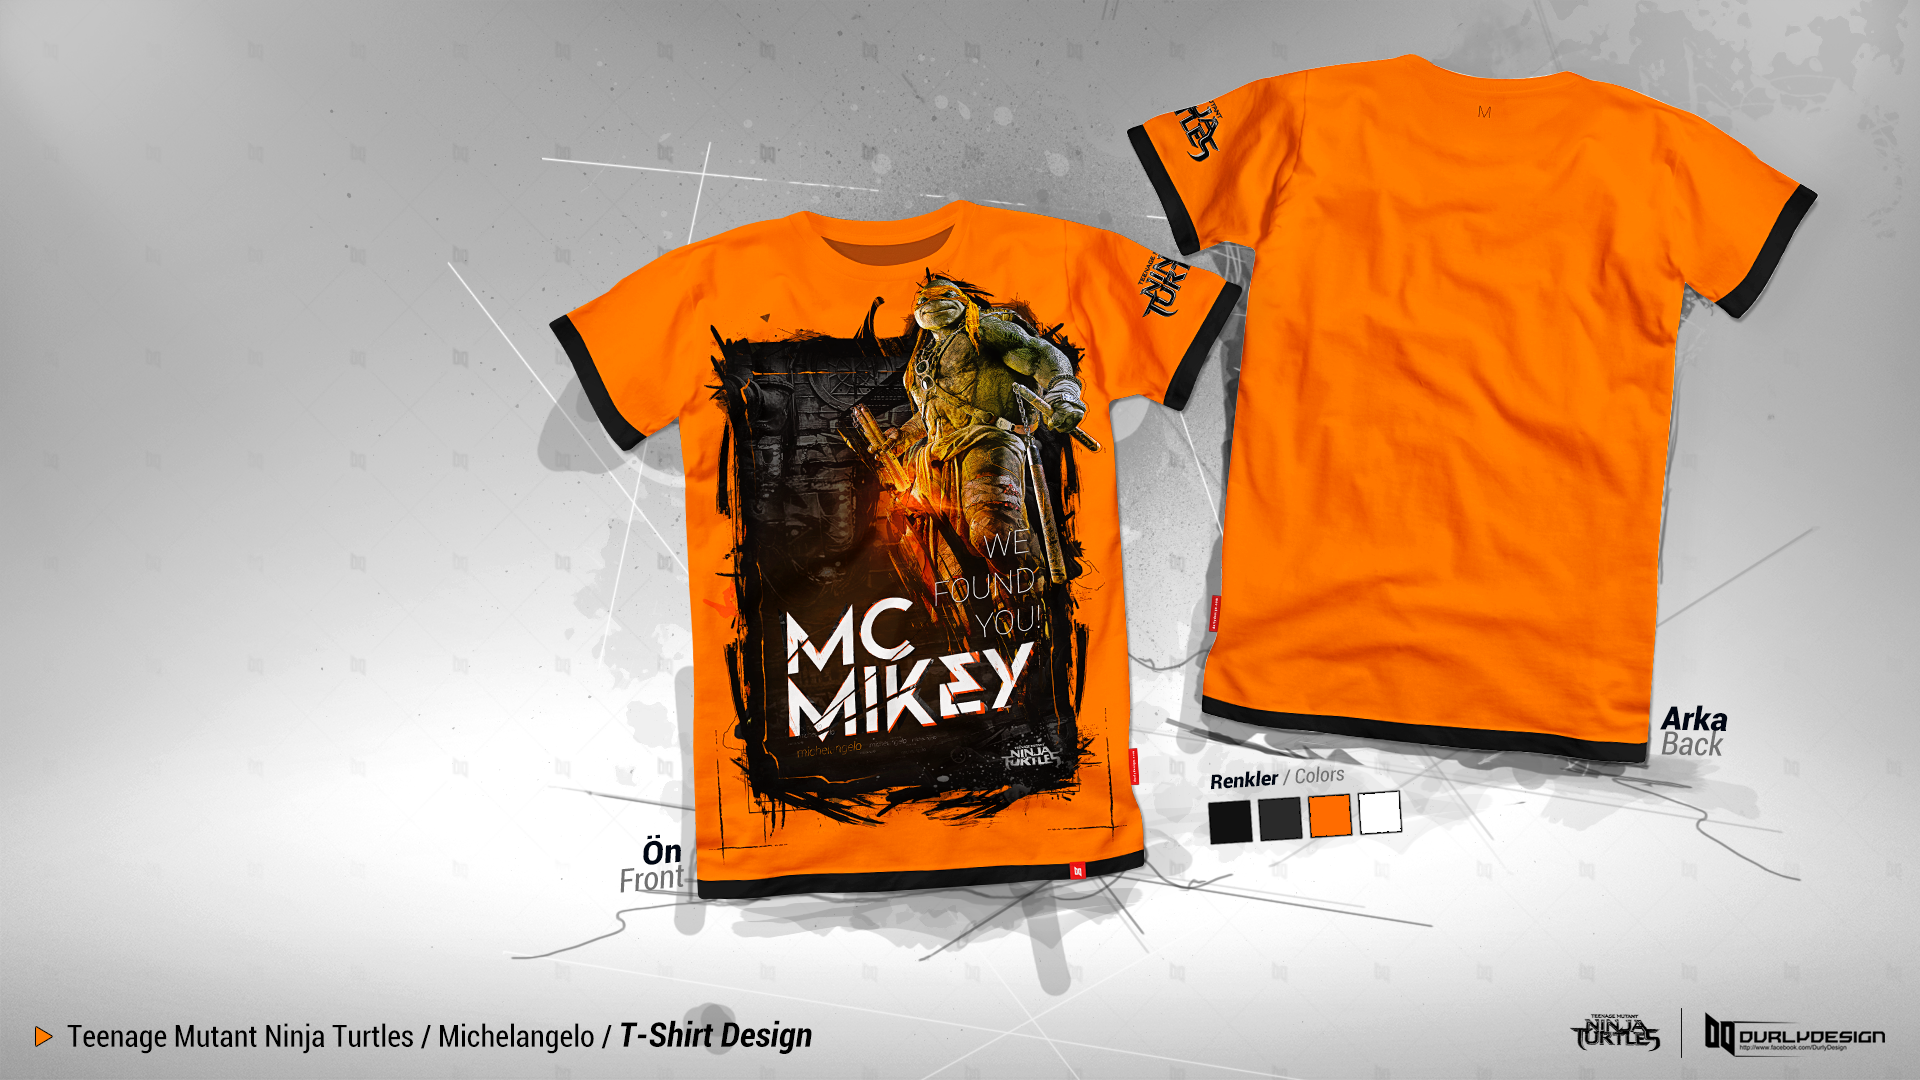 Shirt design wallpaper - Durly0505 1 0 Ninja Turtles Michelangelo T Shirt Design By Durly0505